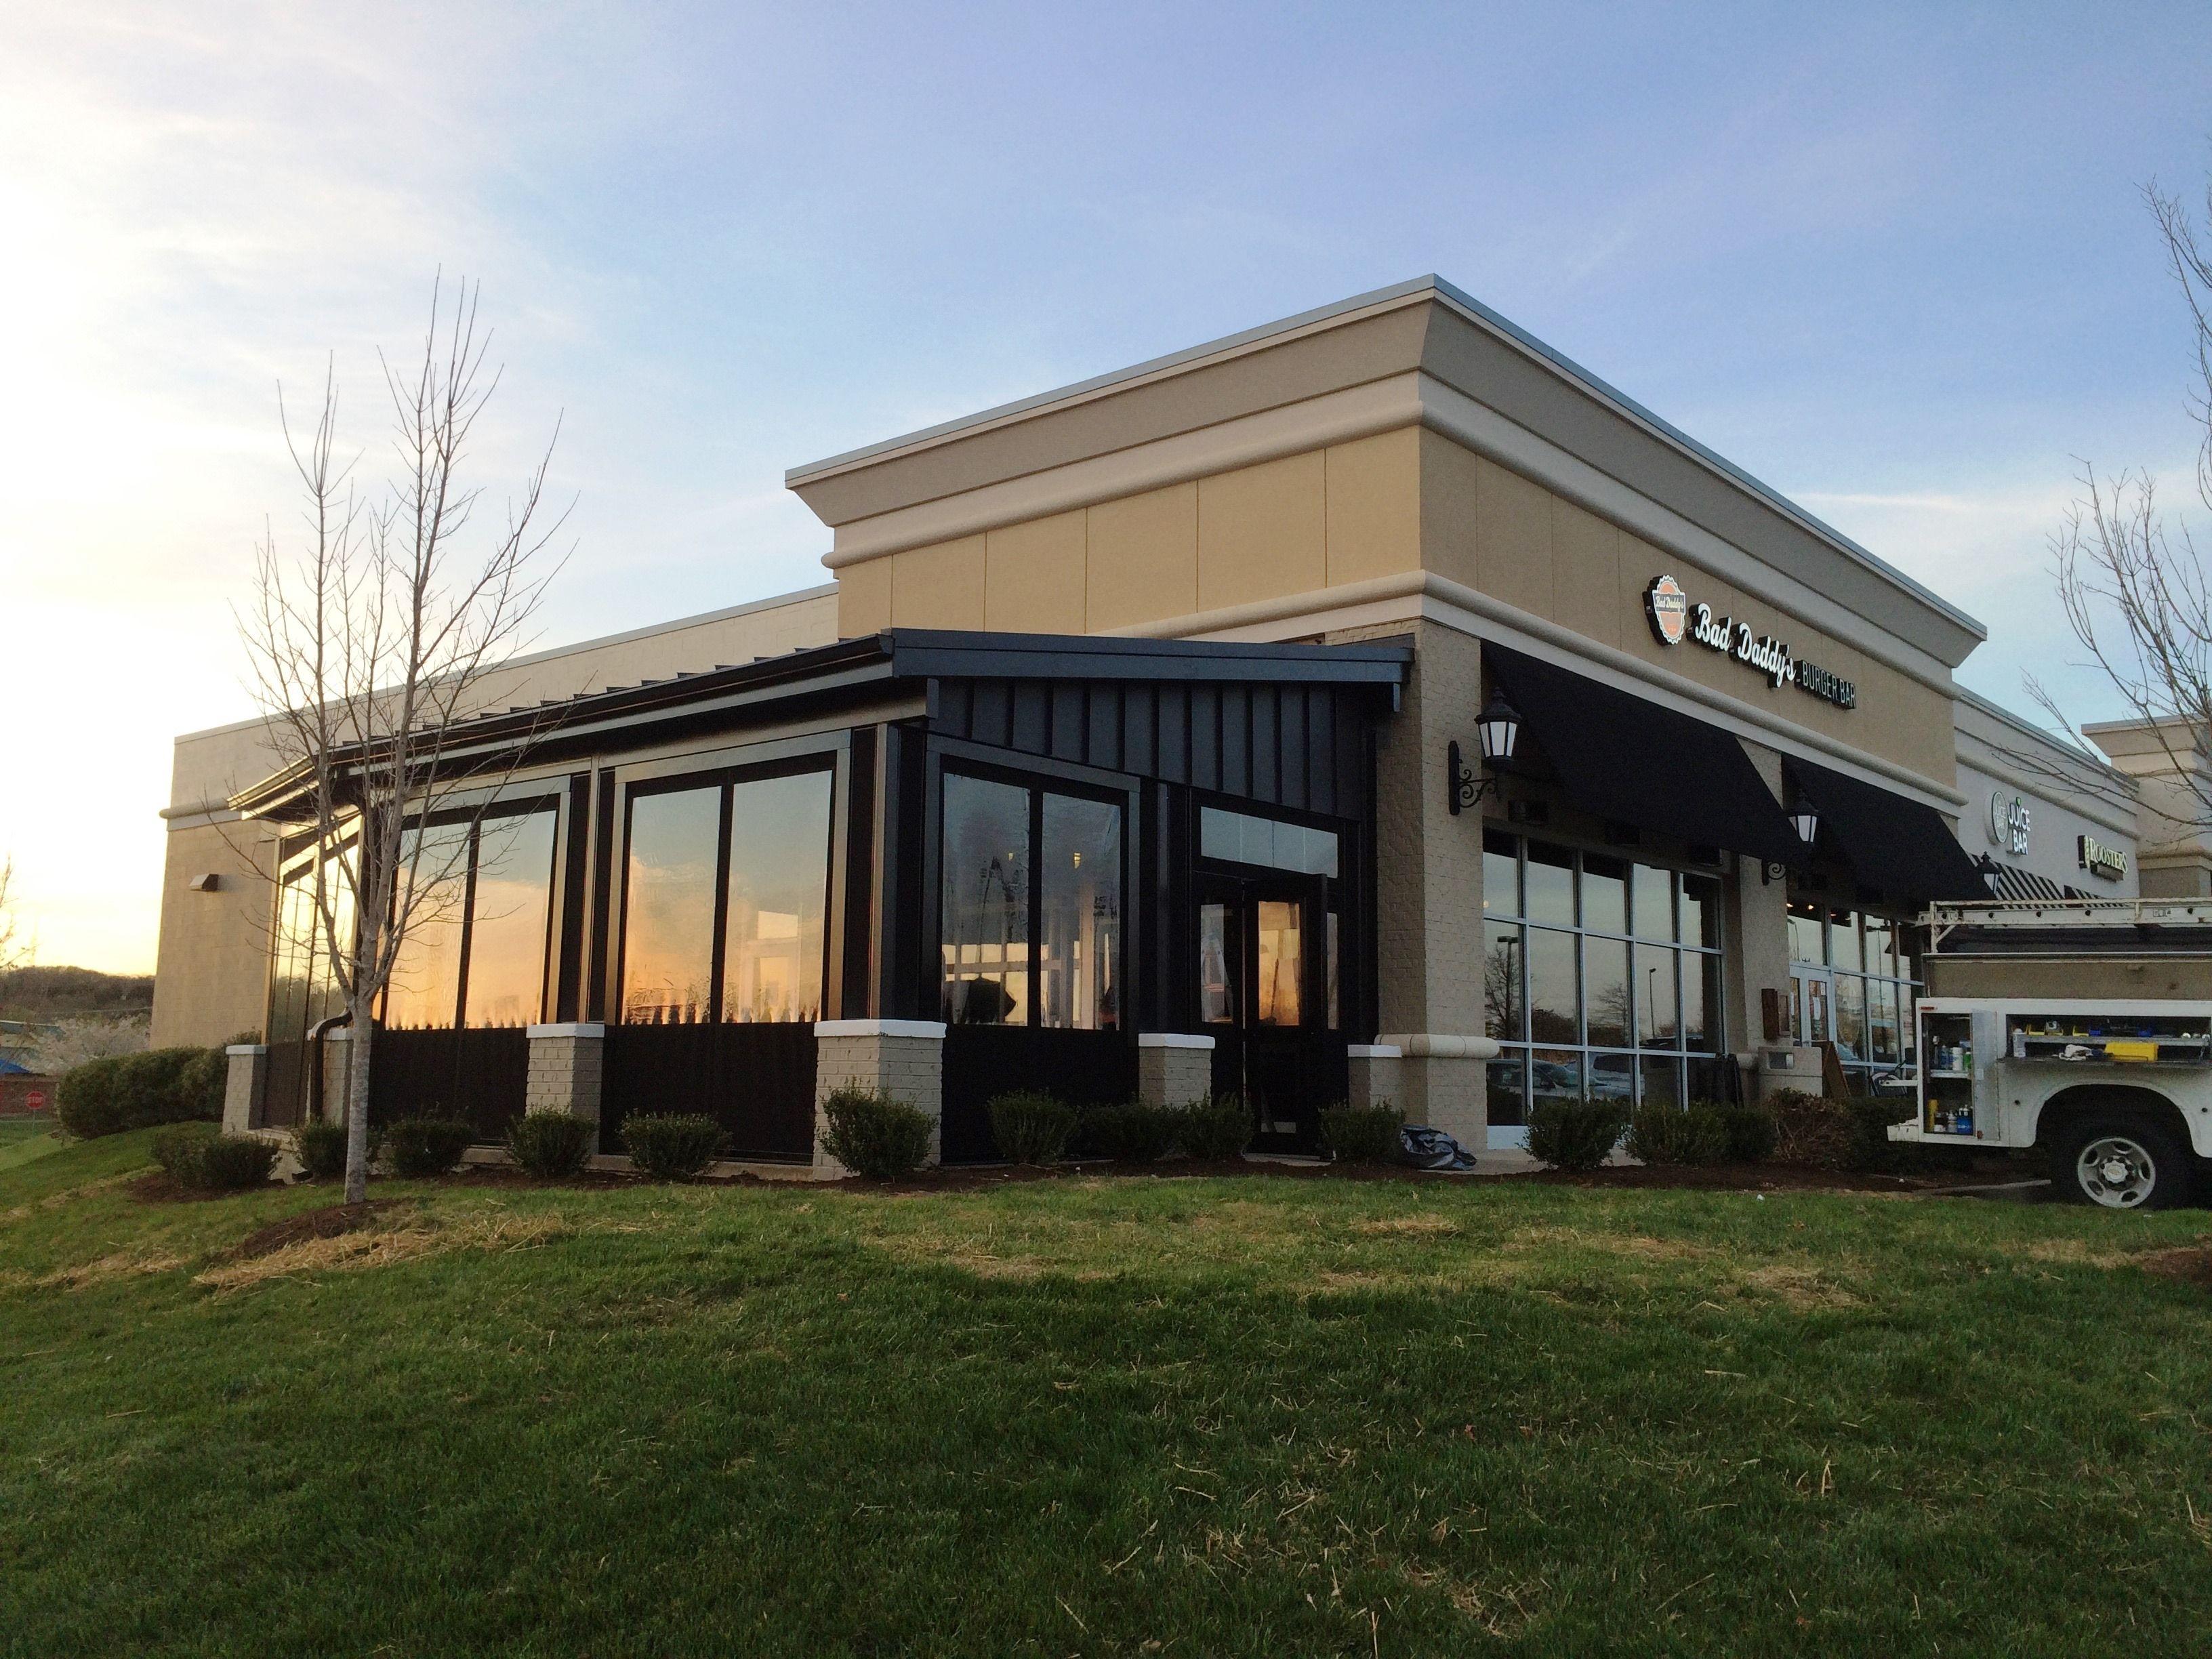 Bad Daddy S Burger Bar Patio Enclosure Knoxville Tn